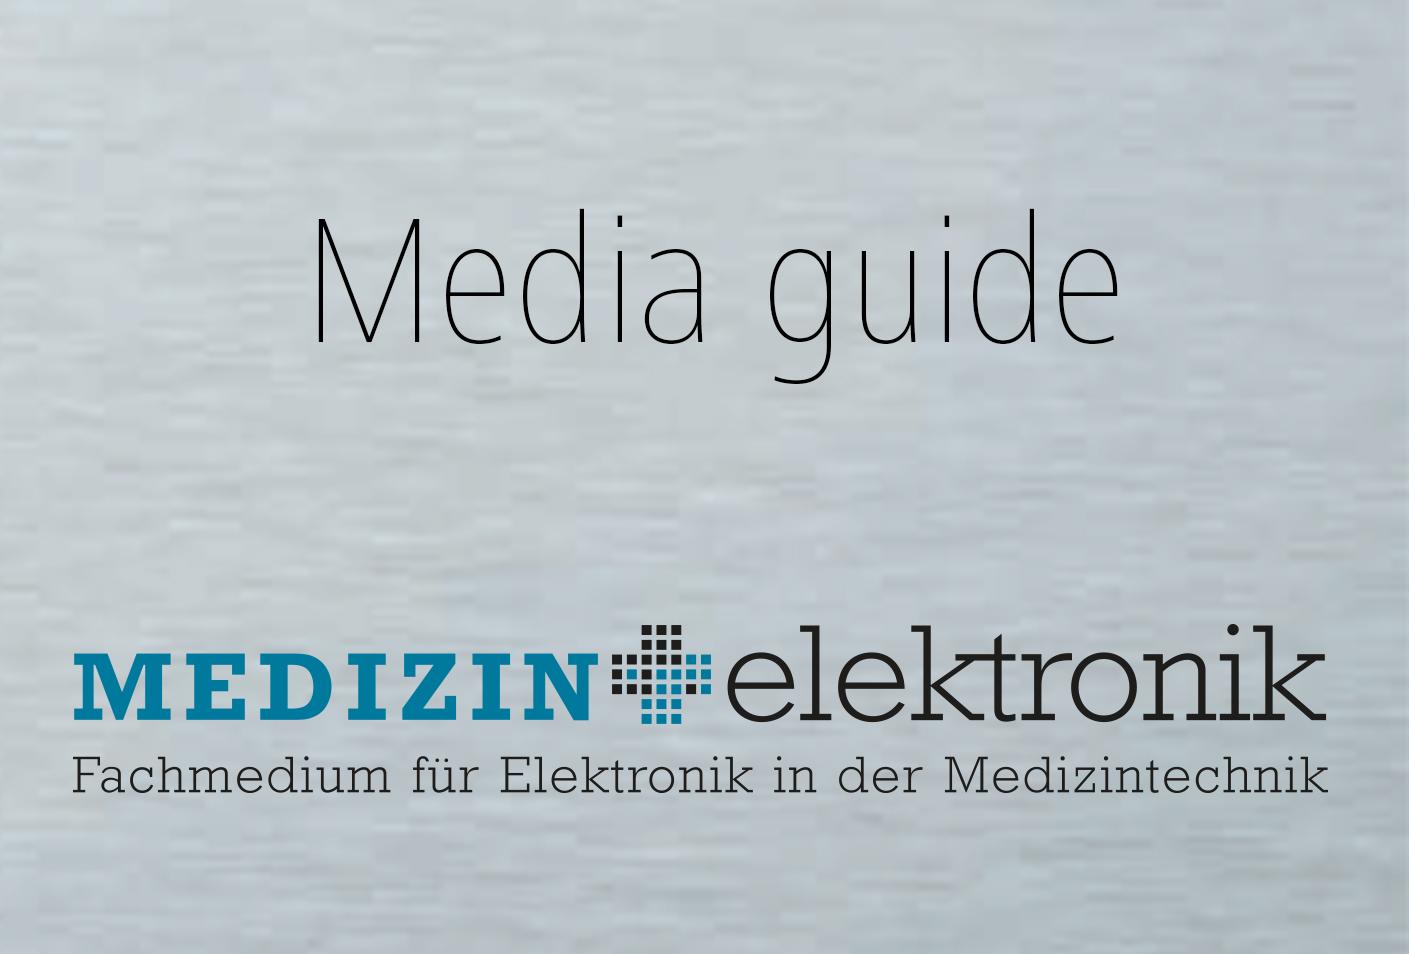 medizin-elektronik